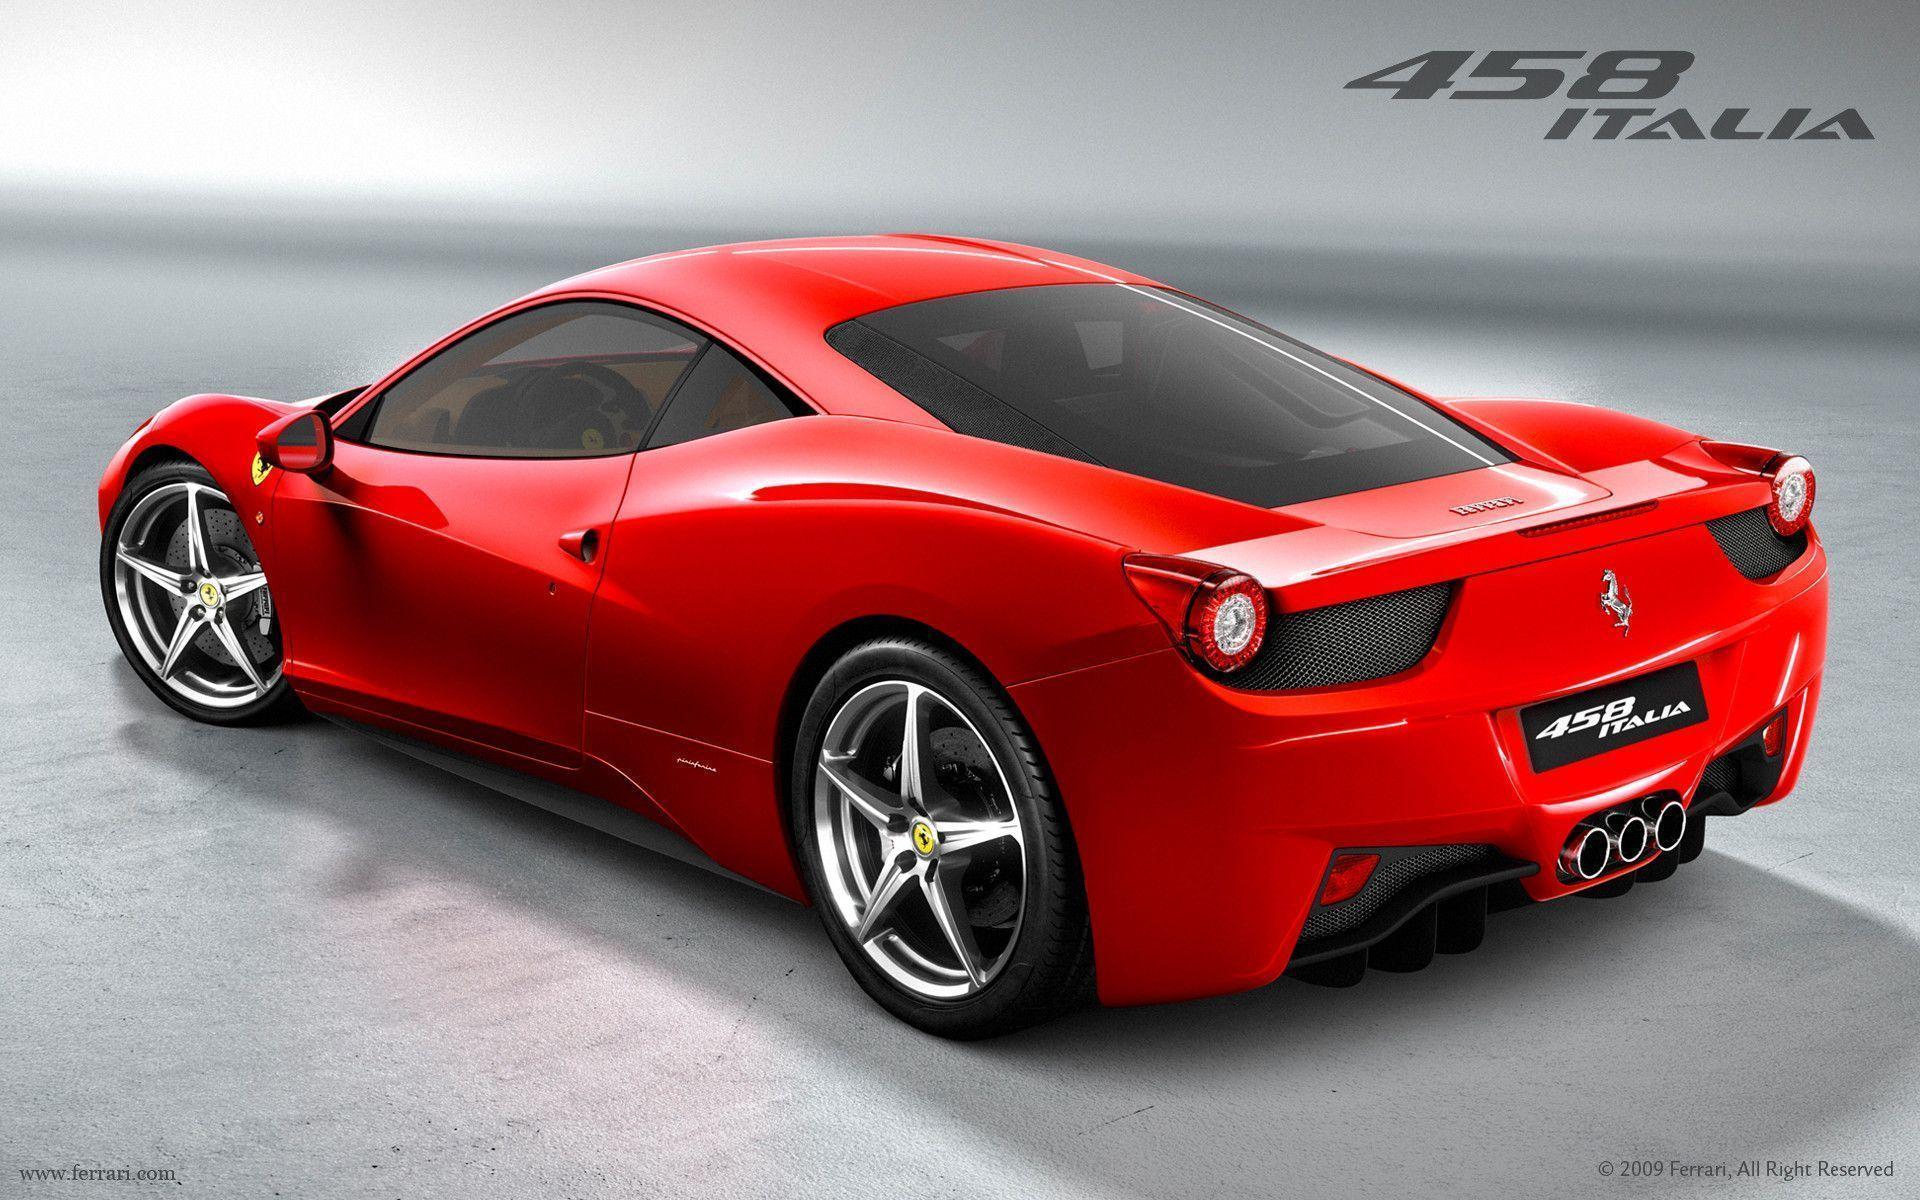 Backgrounds Ferrari California Hd Wallpapers Jpg X